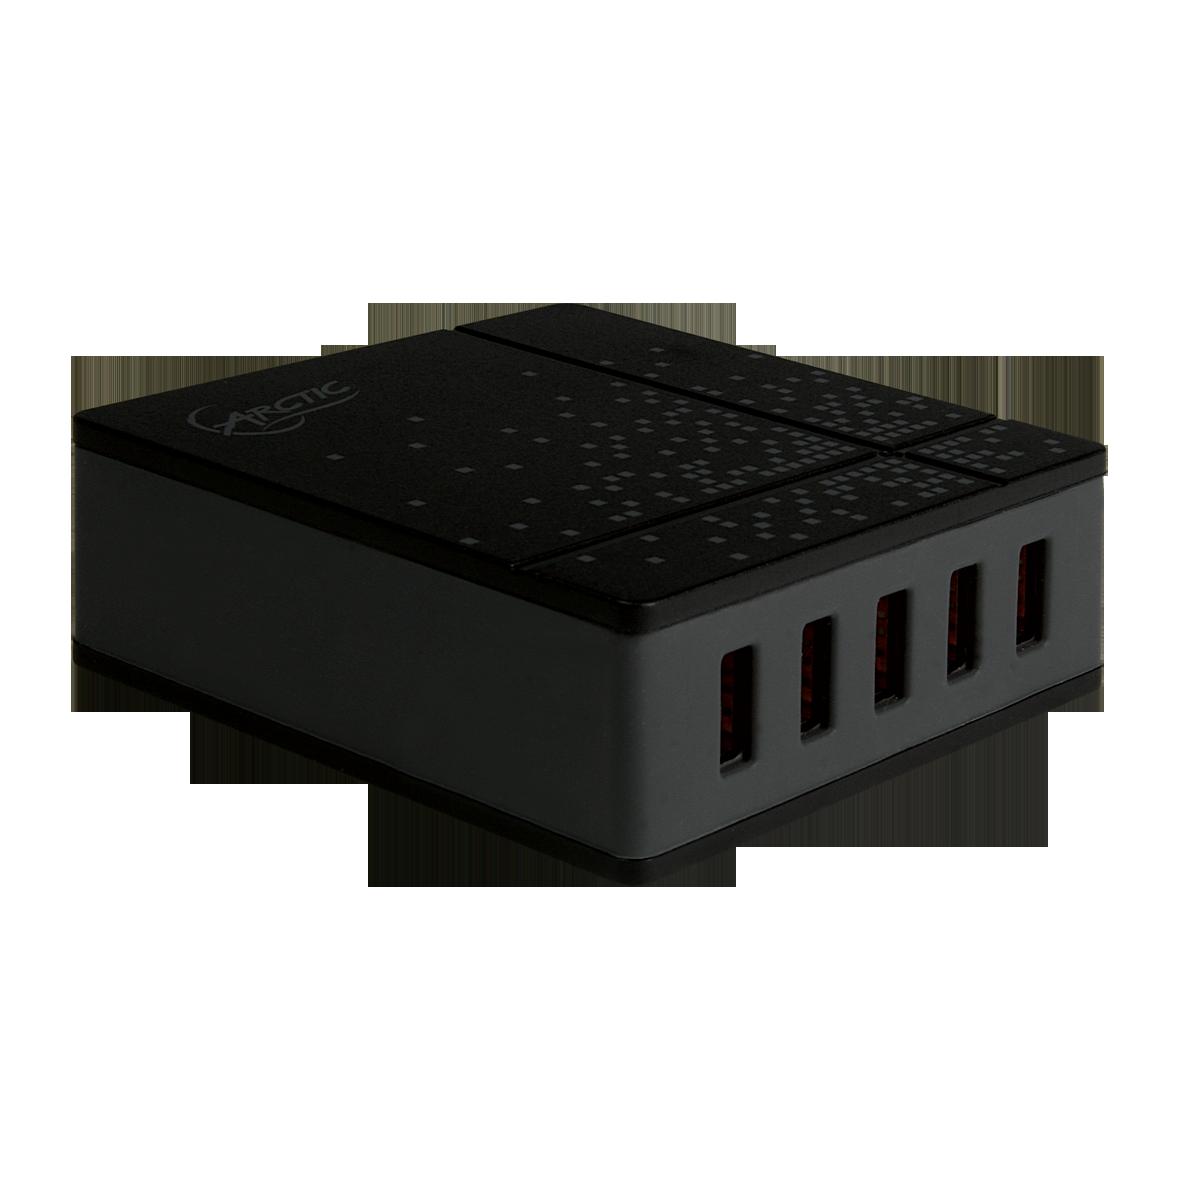 5 Port USB-Schnellladegerät ARCTIC Smart Charger 8000 | UK Version